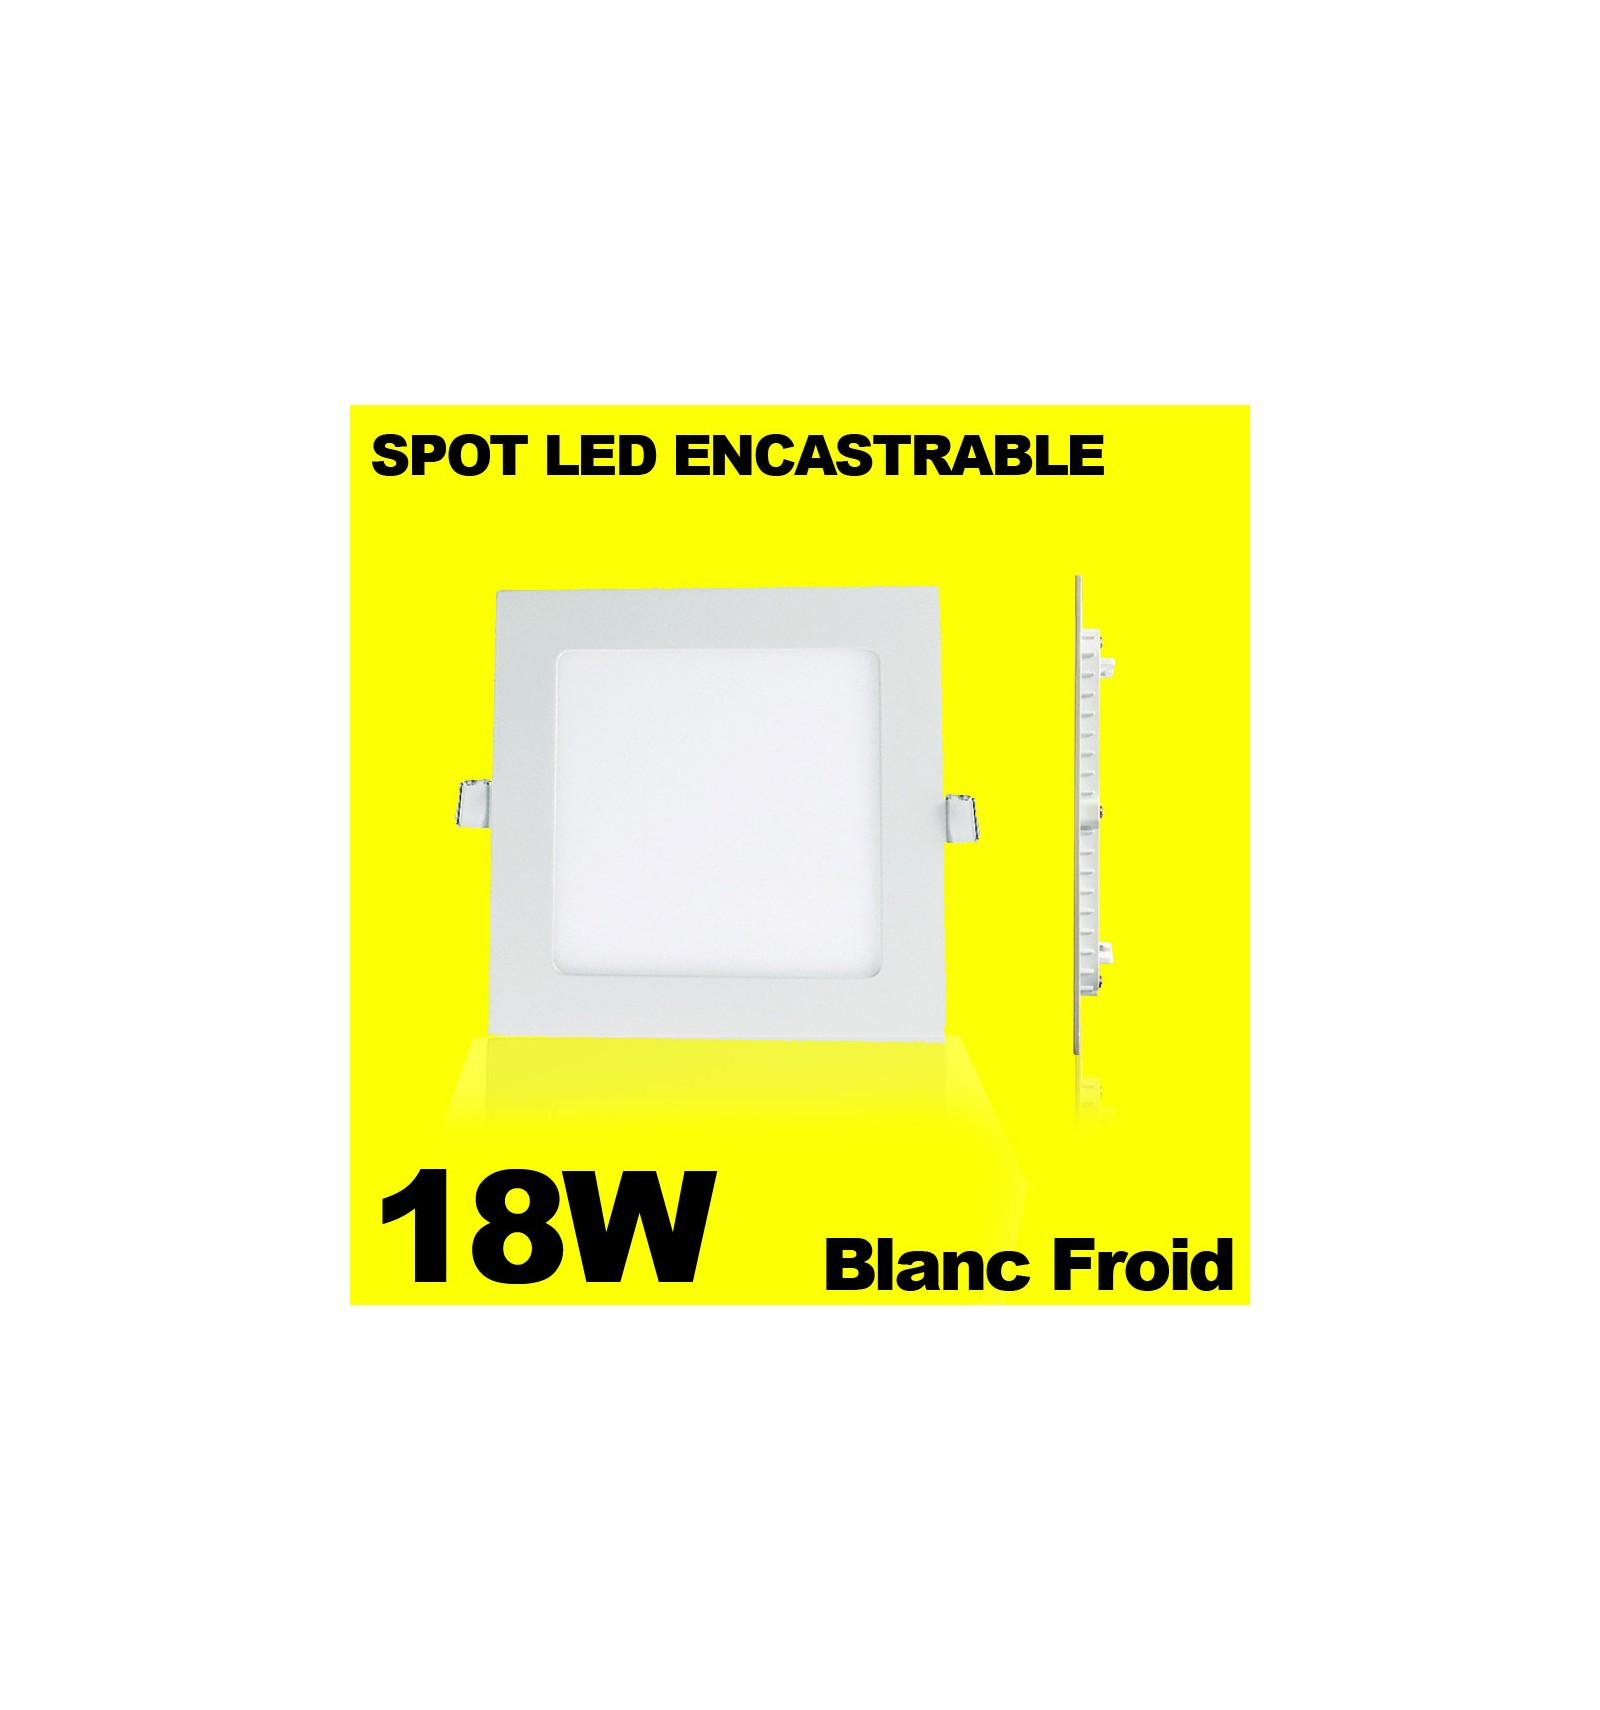 spot encastrable led carre downlight panel extra plat 18w blanc froid. Black Bedroom Furniture Sets. Home Design Ideas